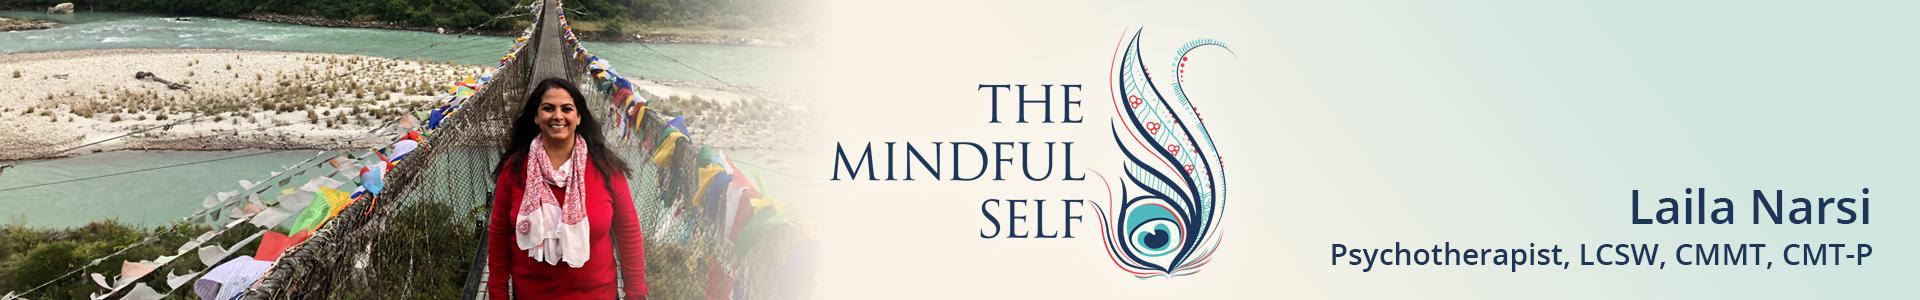 The Mindful Self